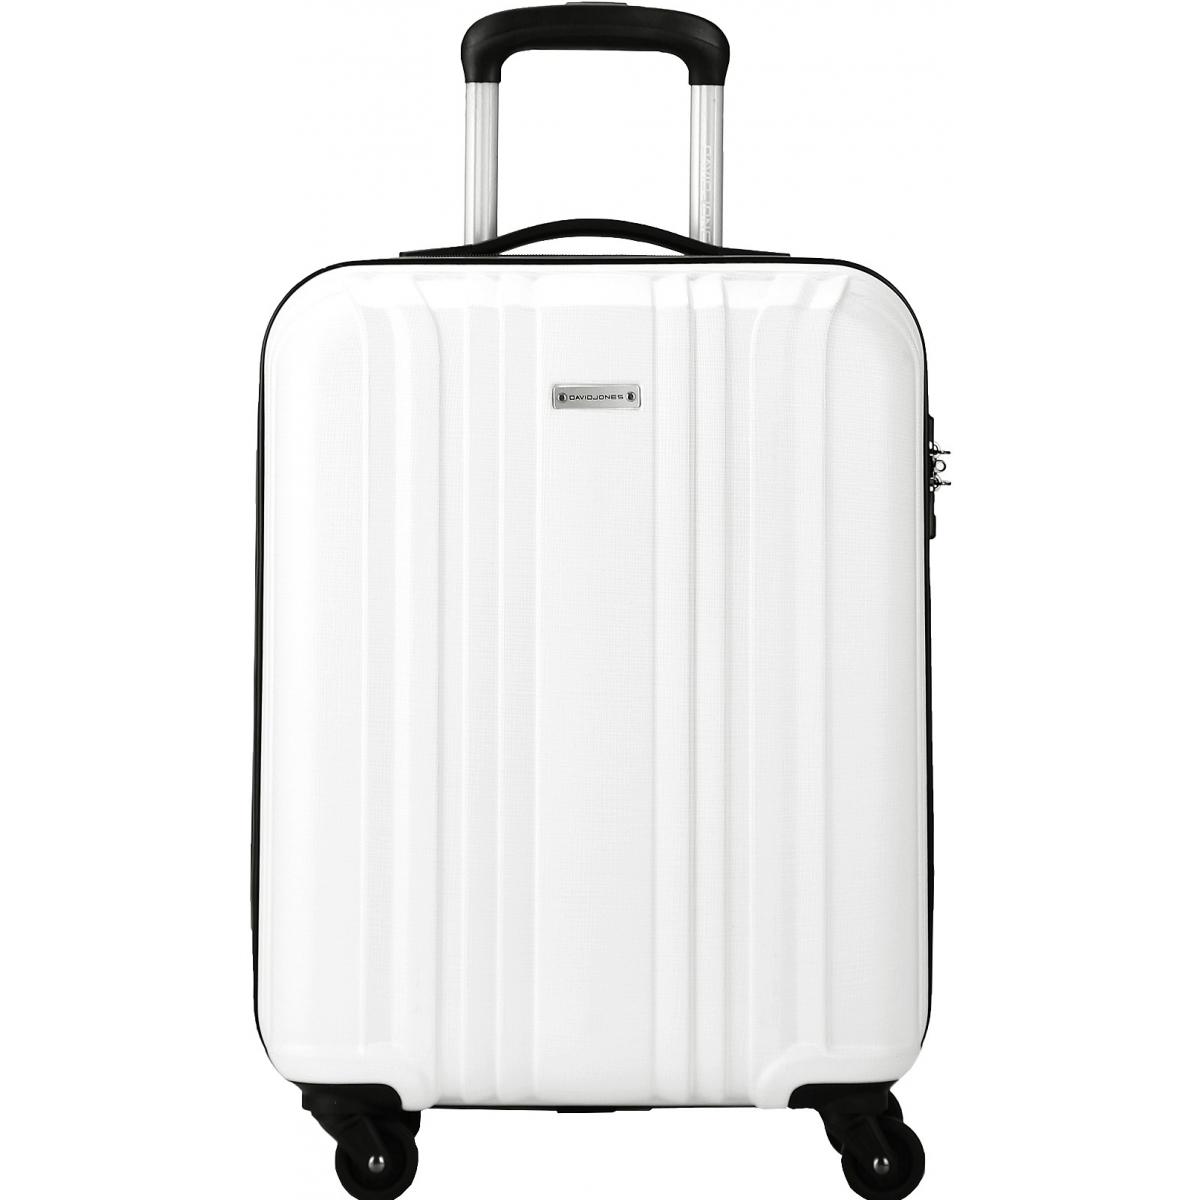 valise cabine rigide david jones 55cm ba10171p couleur principale white promotion. Black Bedroom Furniture Sets. Home Design Ideas